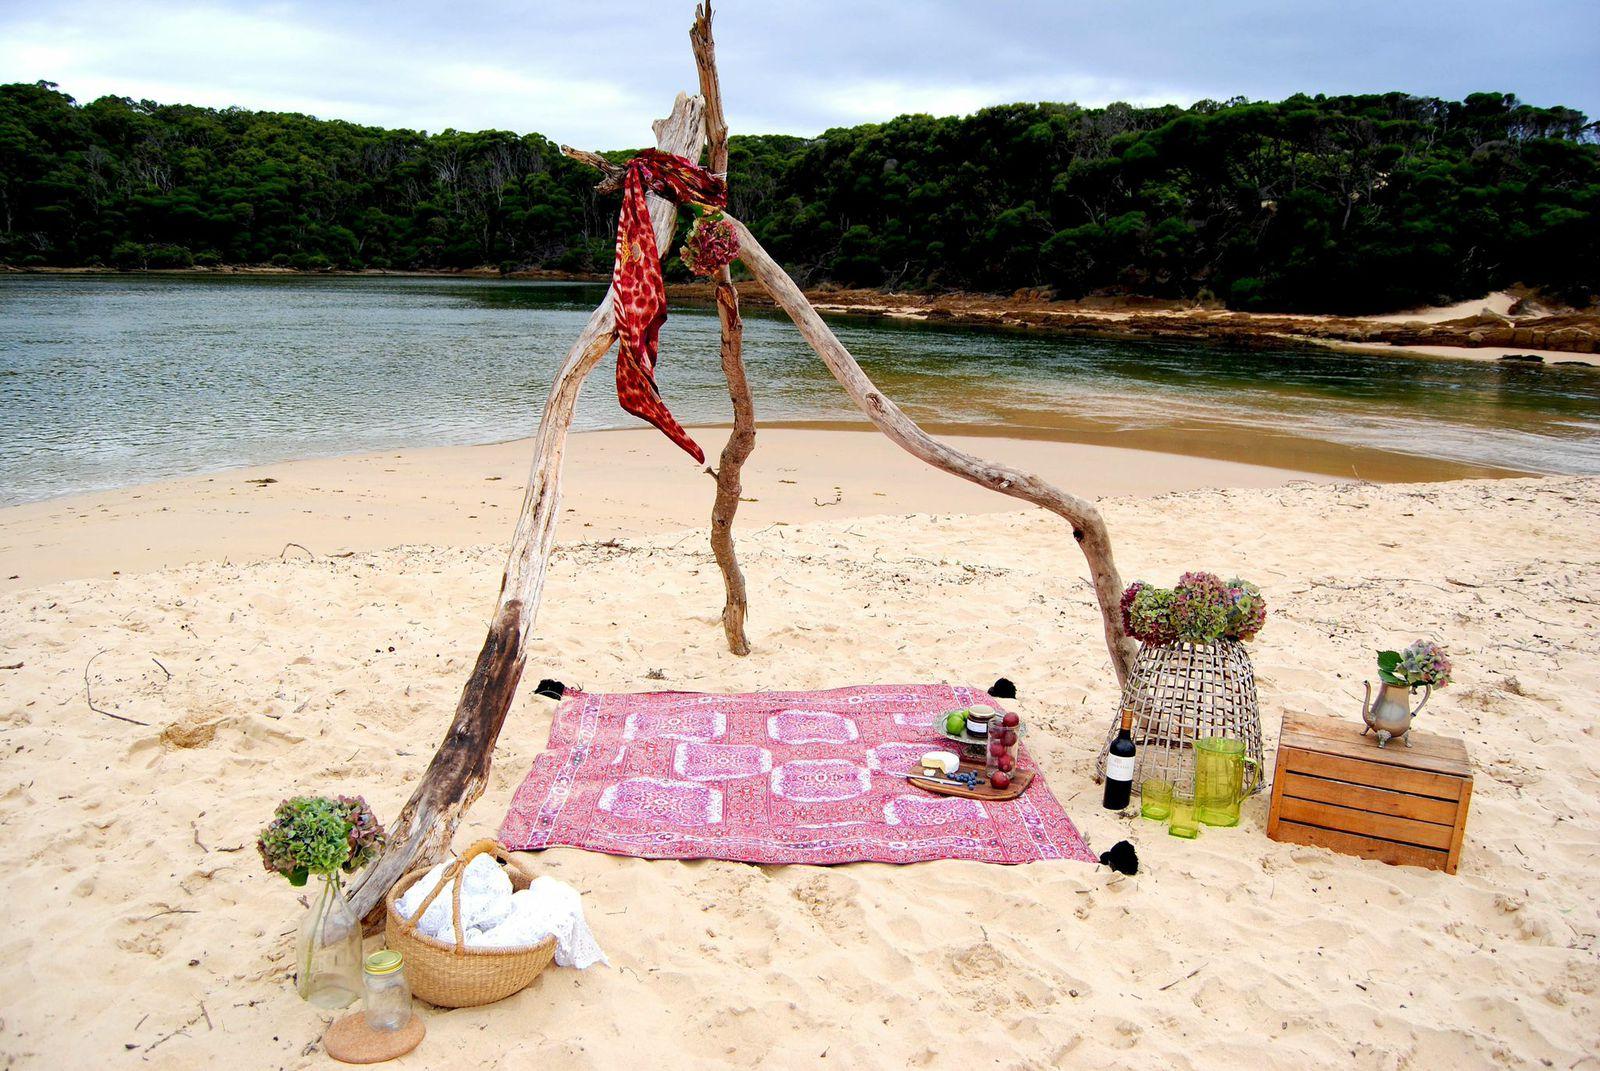 Wandering Folk Picnic Rug